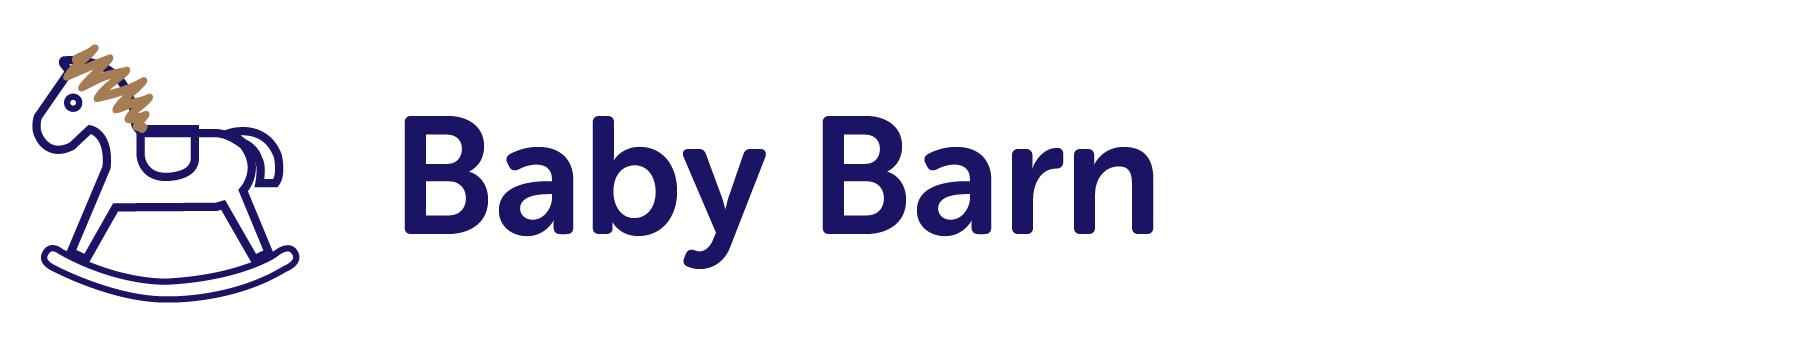 Baby Barn